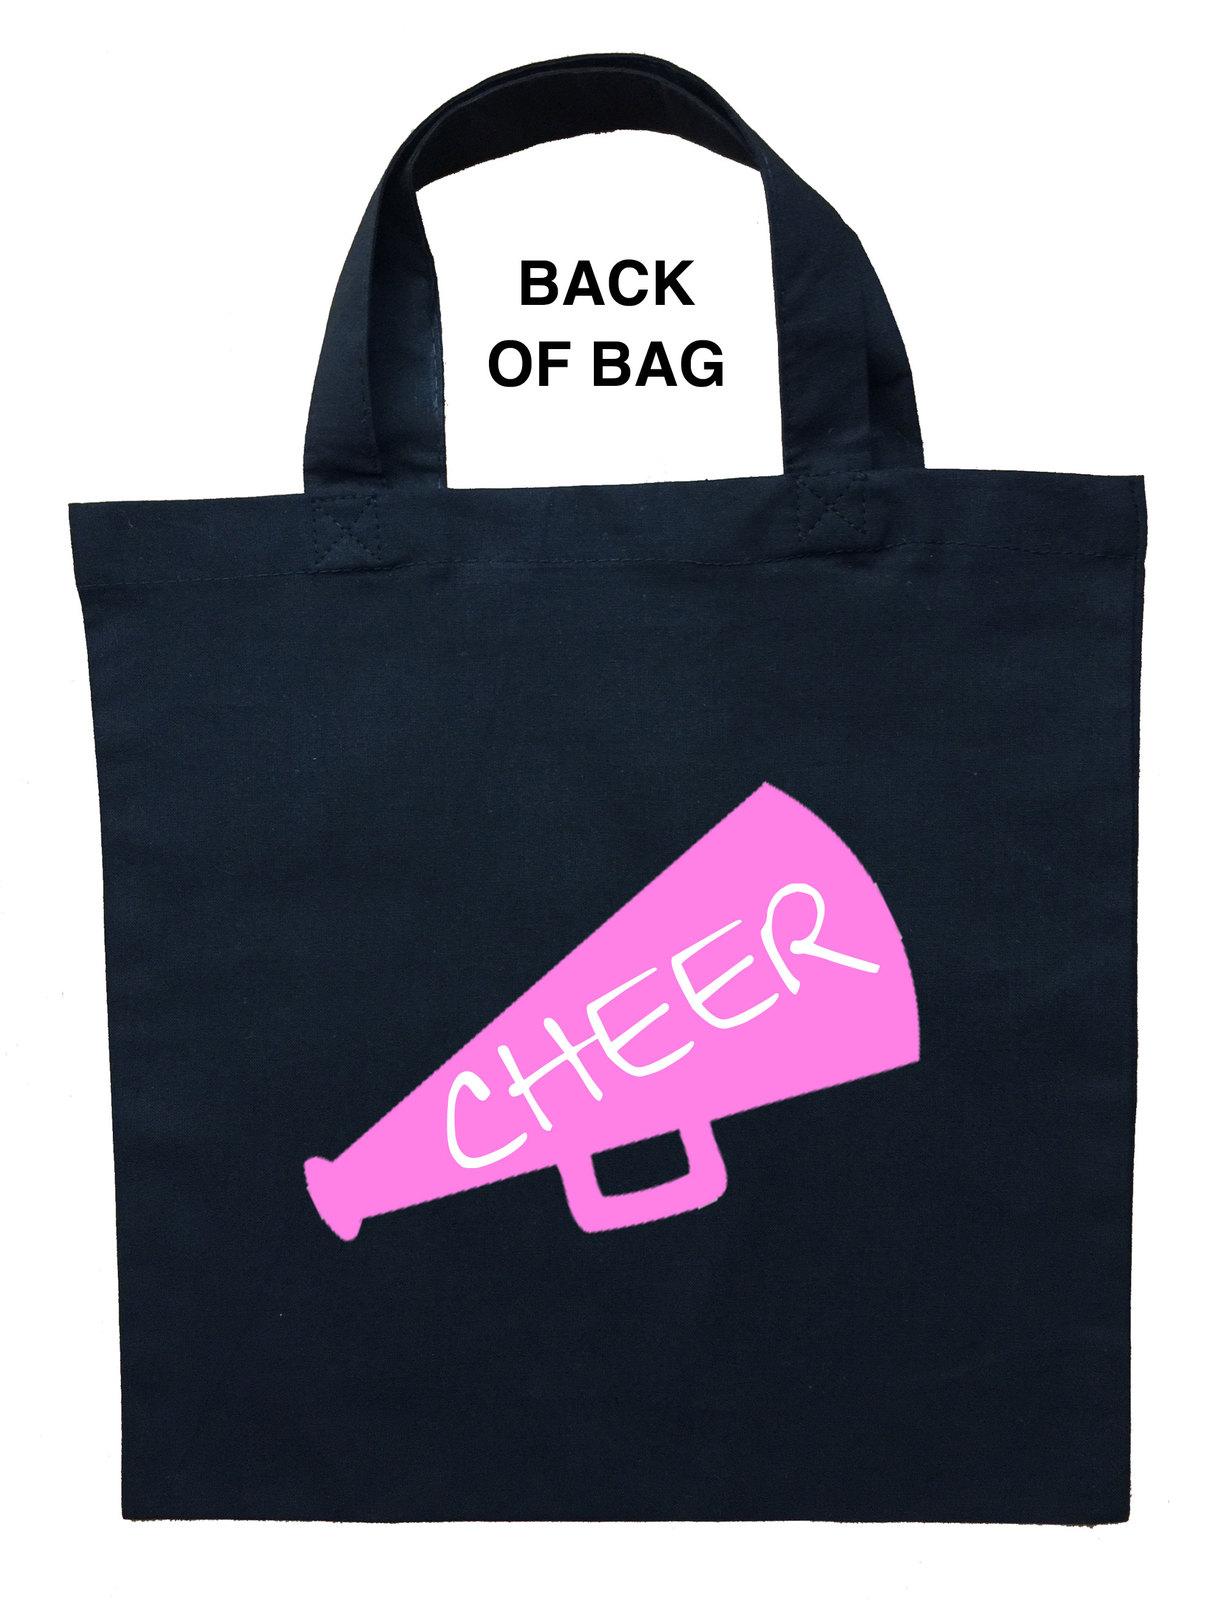 Cheerleader Trick or Treat Bag, Cheerleader Halloween Bag, Cheerleader Bag